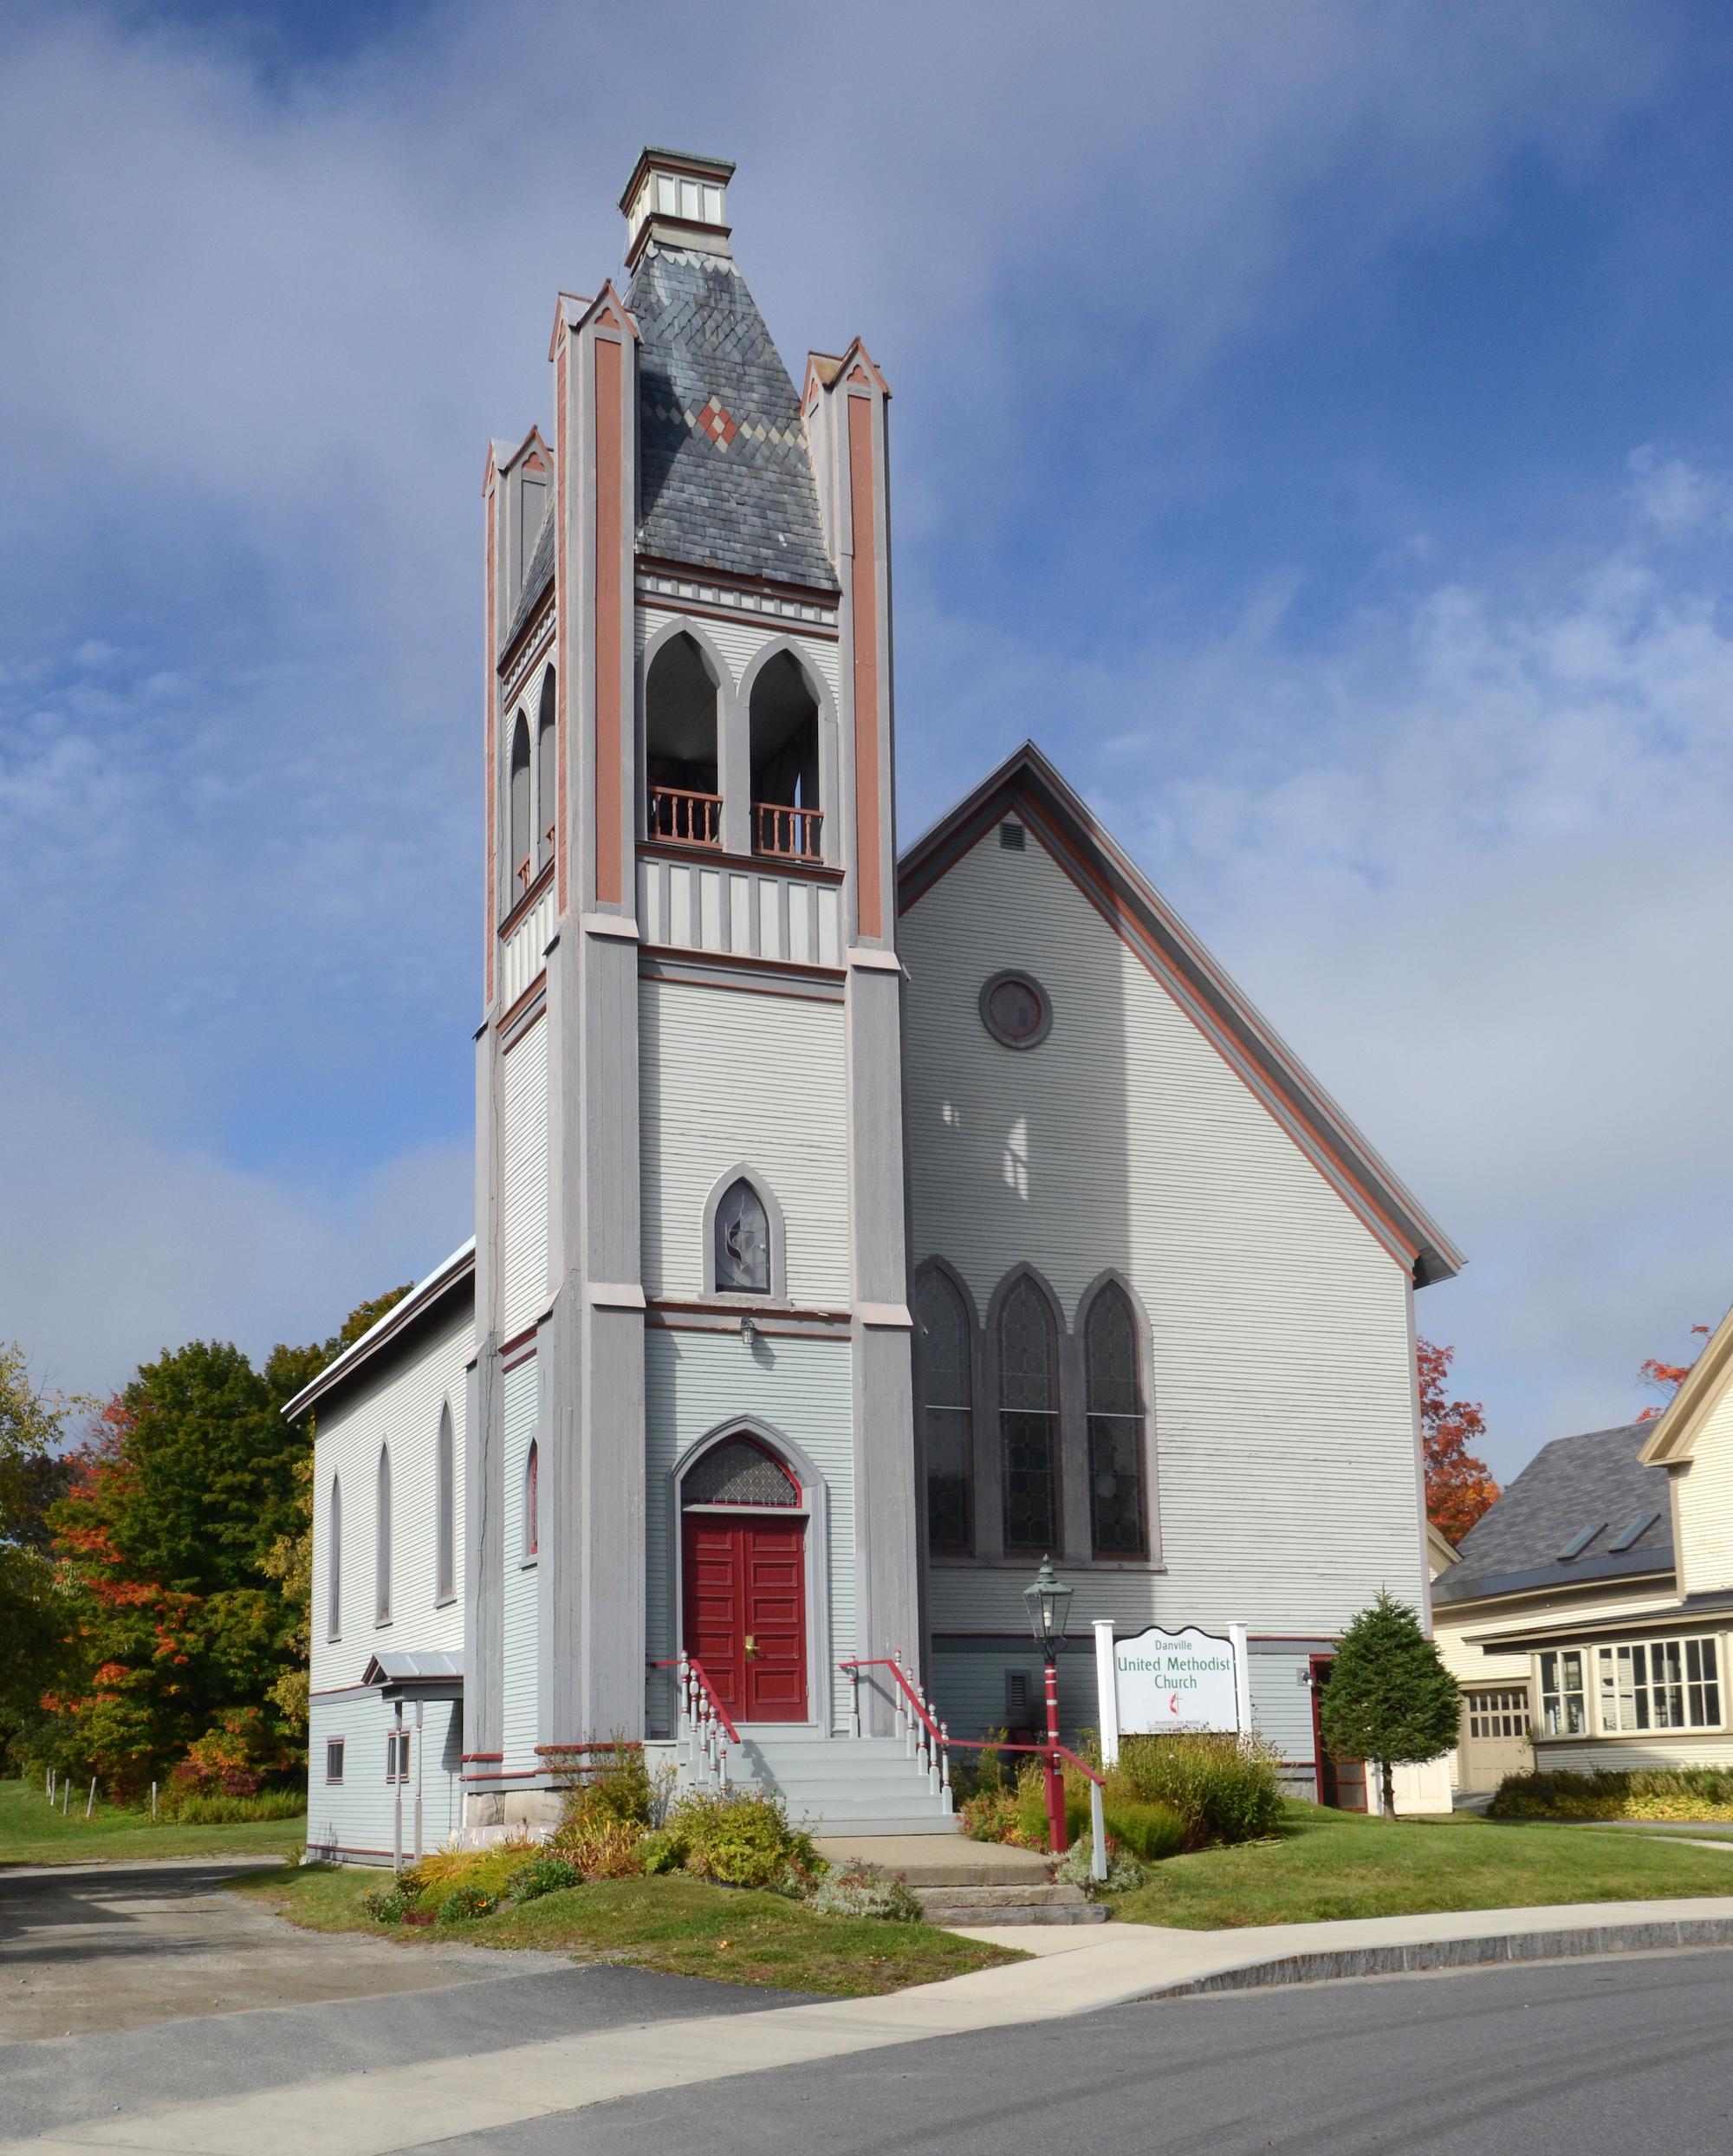 Danville Green Project Methodist Church